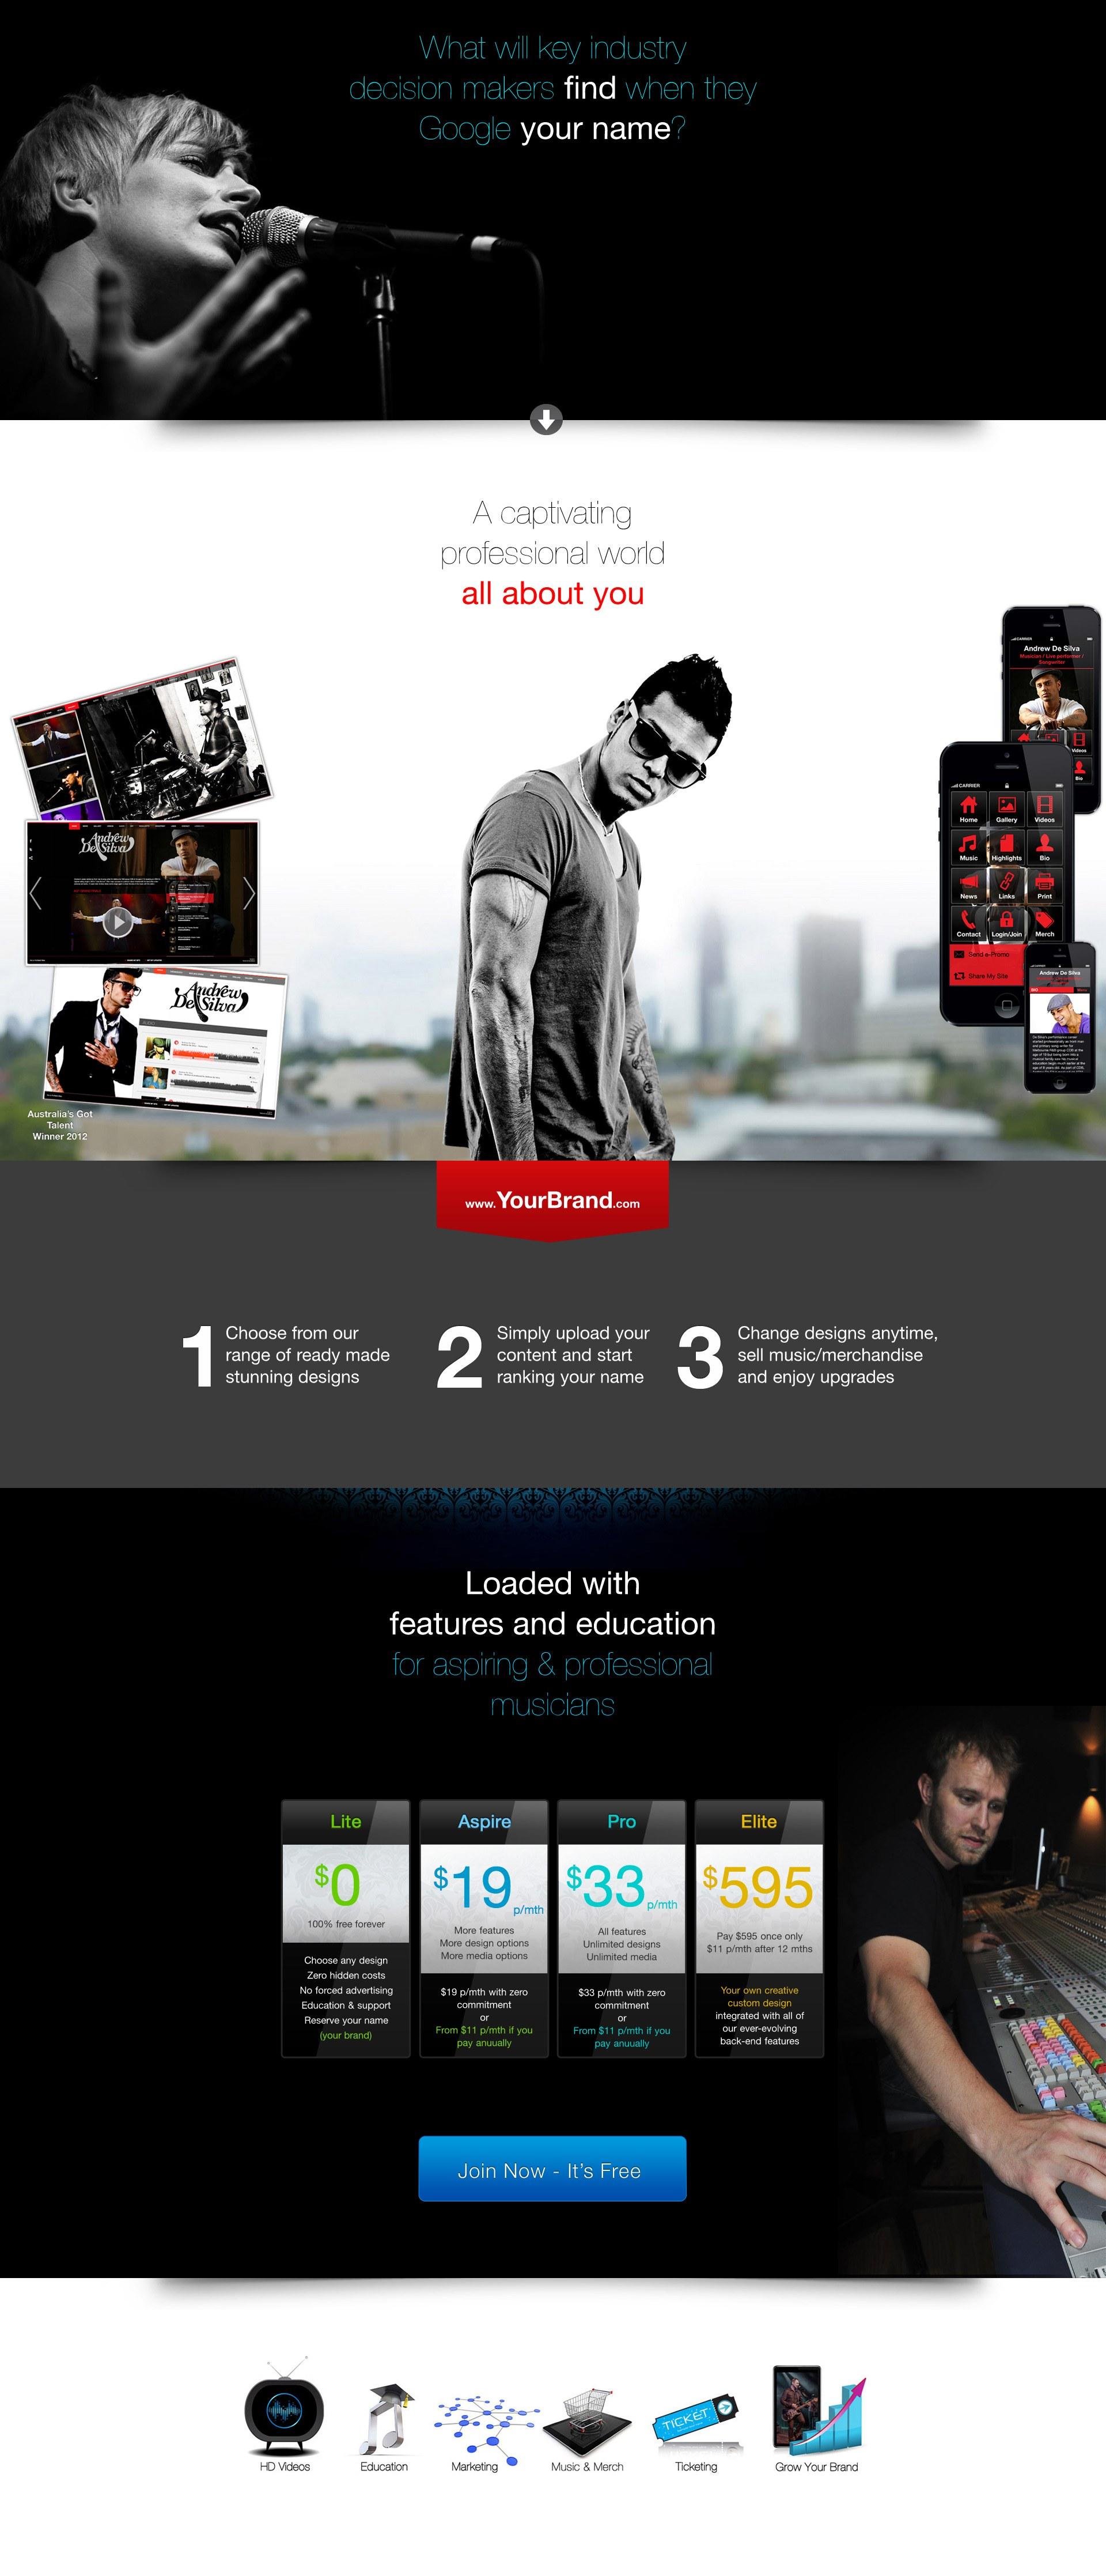 53fa9ef07a3eaa5860e8c98d_ProMusic-ProjectPart-2.jpg